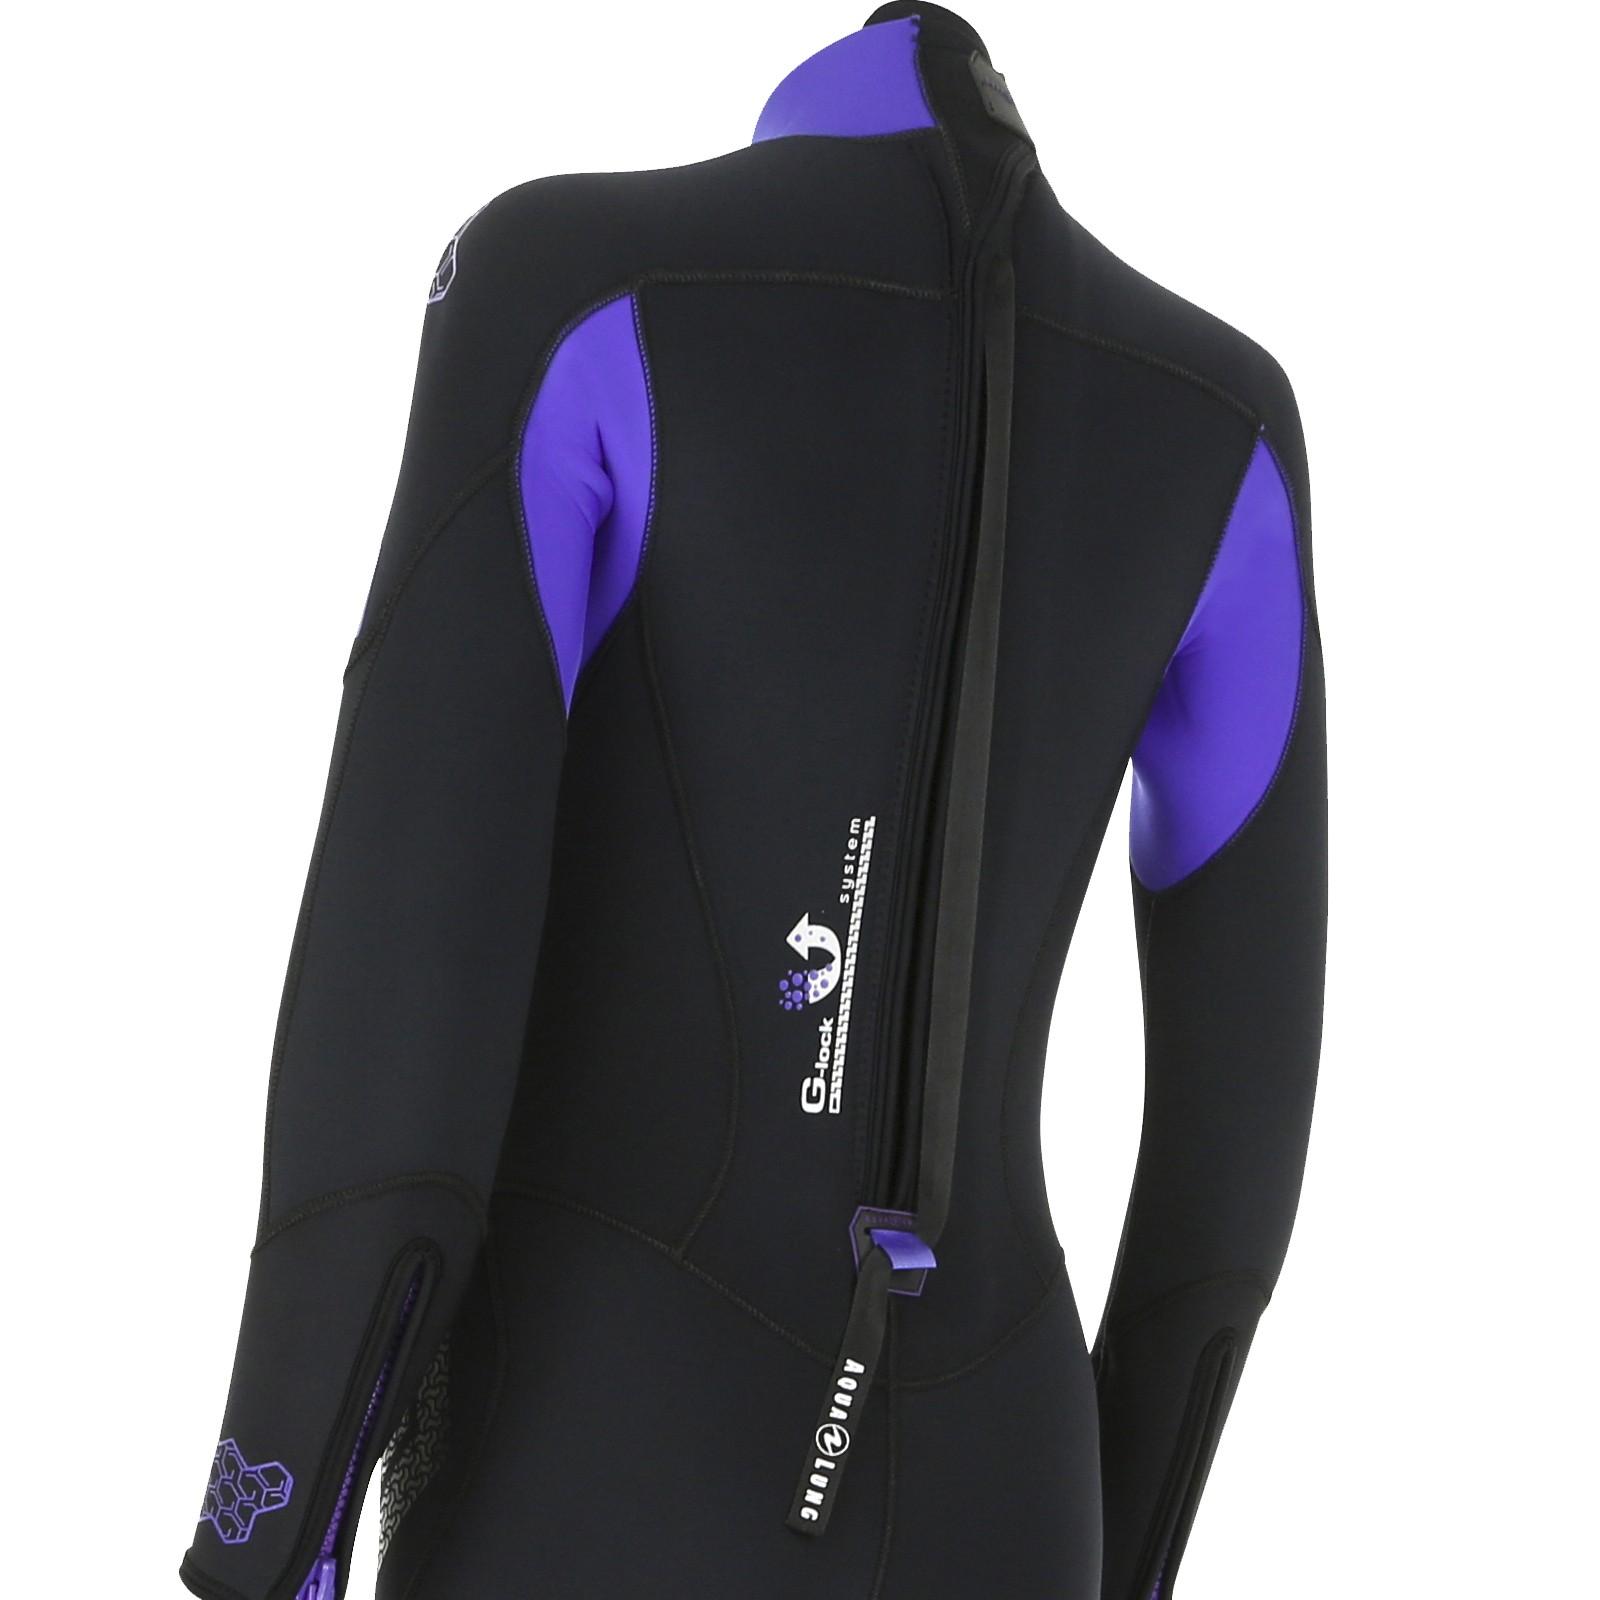 Aqualung Neoprenanzug 5,5mm Balance Comfort Damen